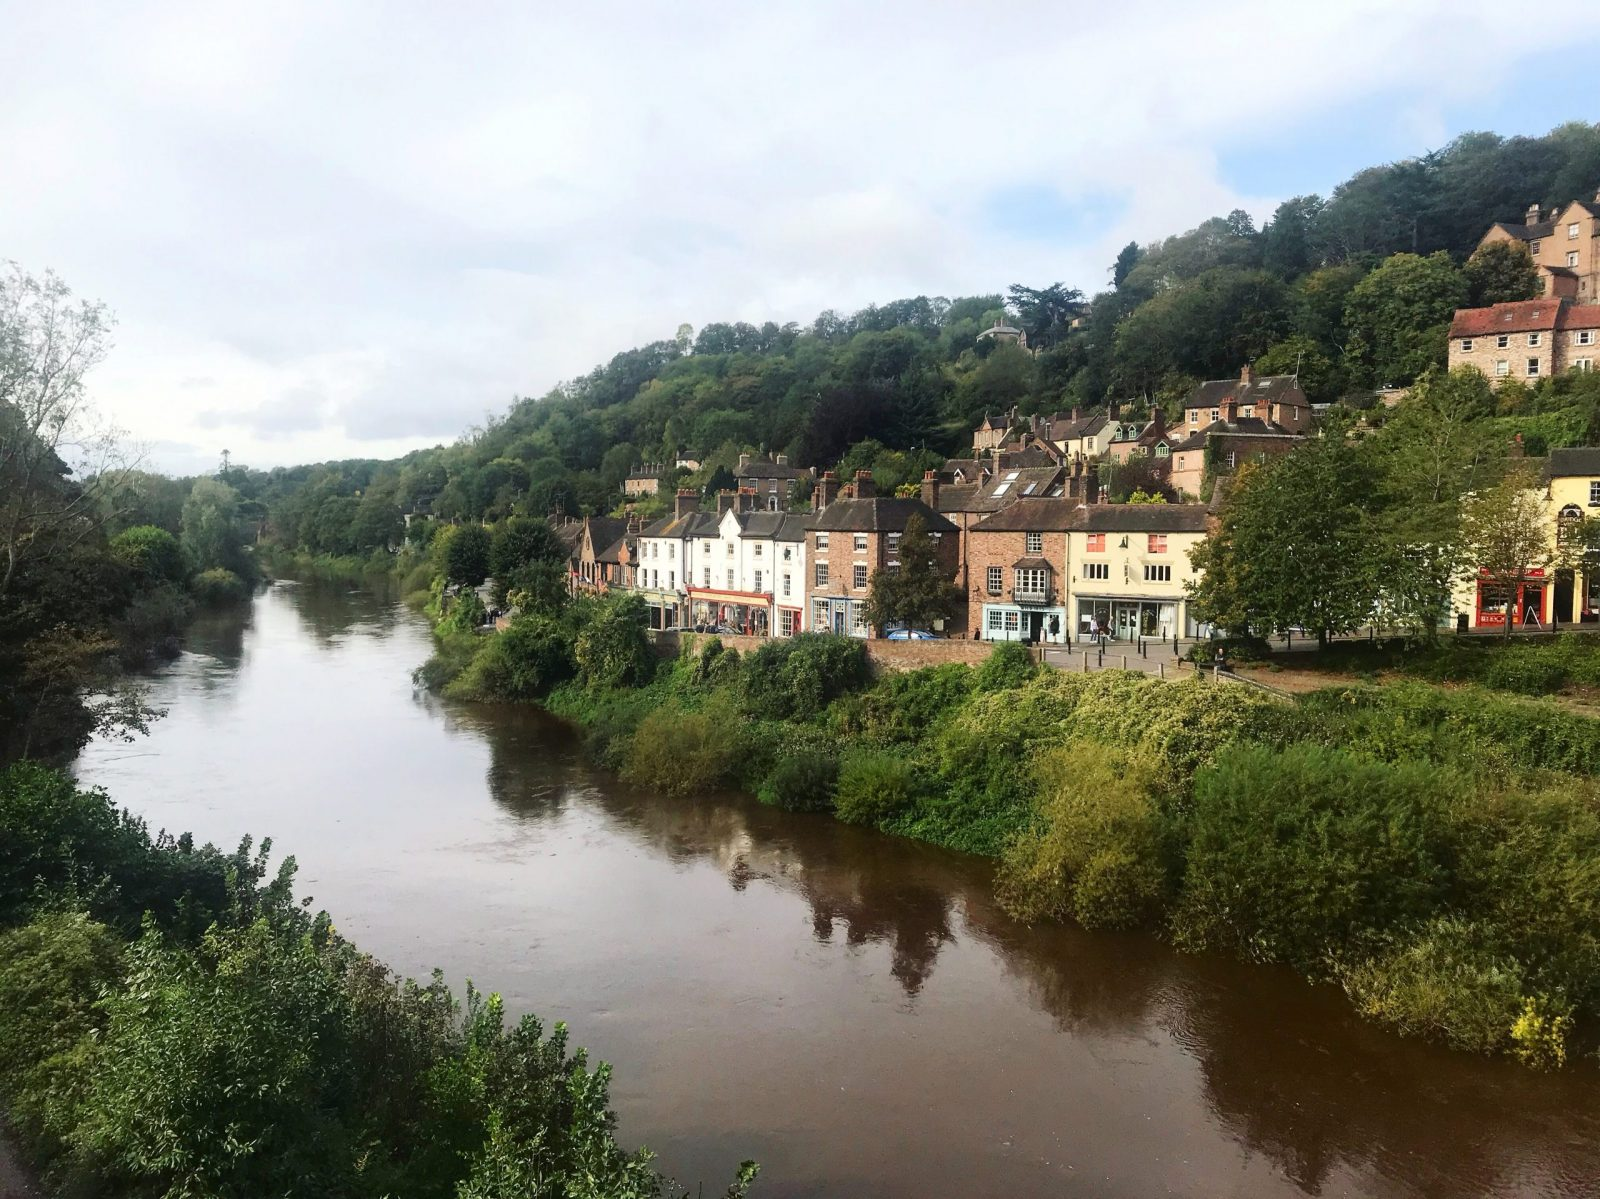 Visiting Ironbridge a 3 day itinerary